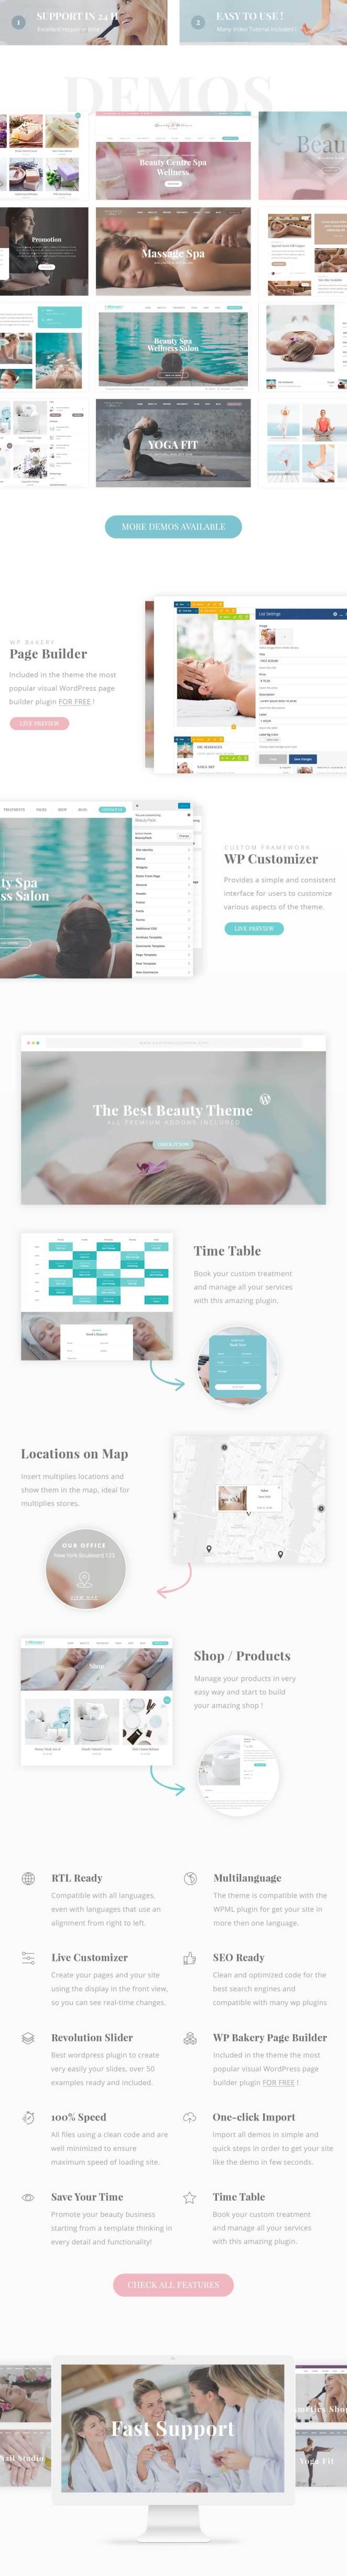 Beauty Pack - Wellness Spa & Beauty Massage Salons WP - 1